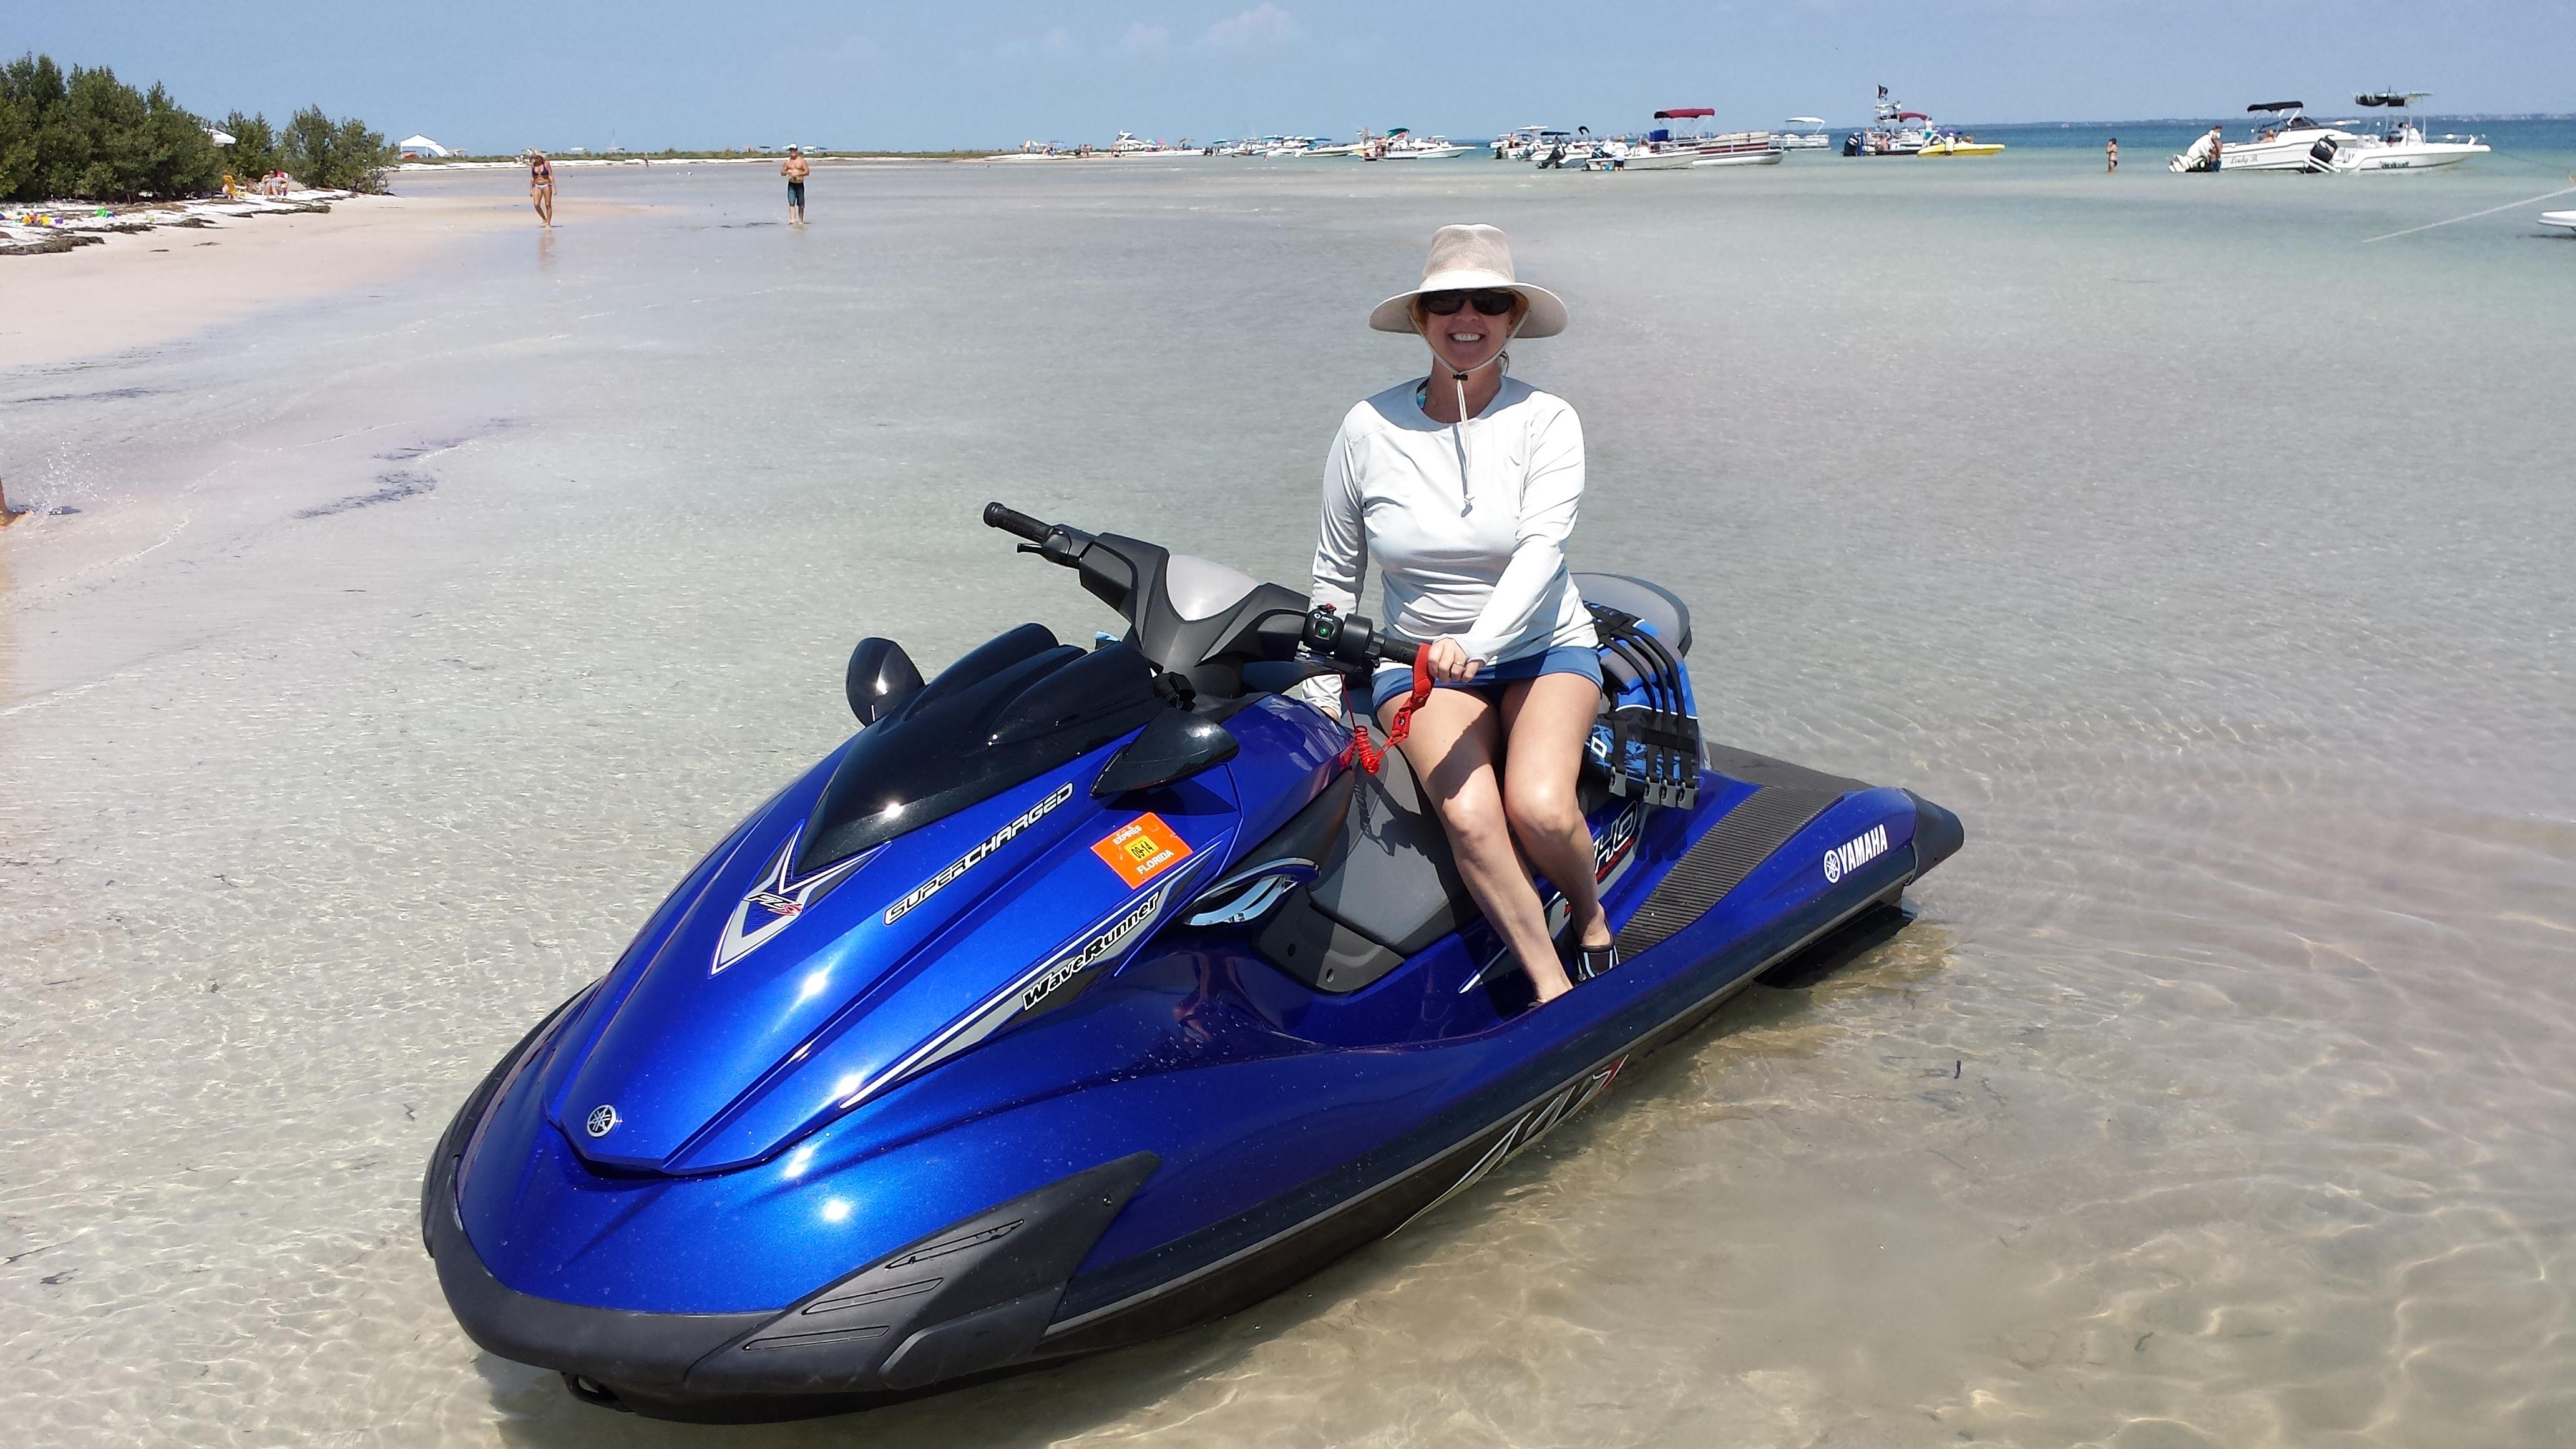 Josee sitting on blue waverunner